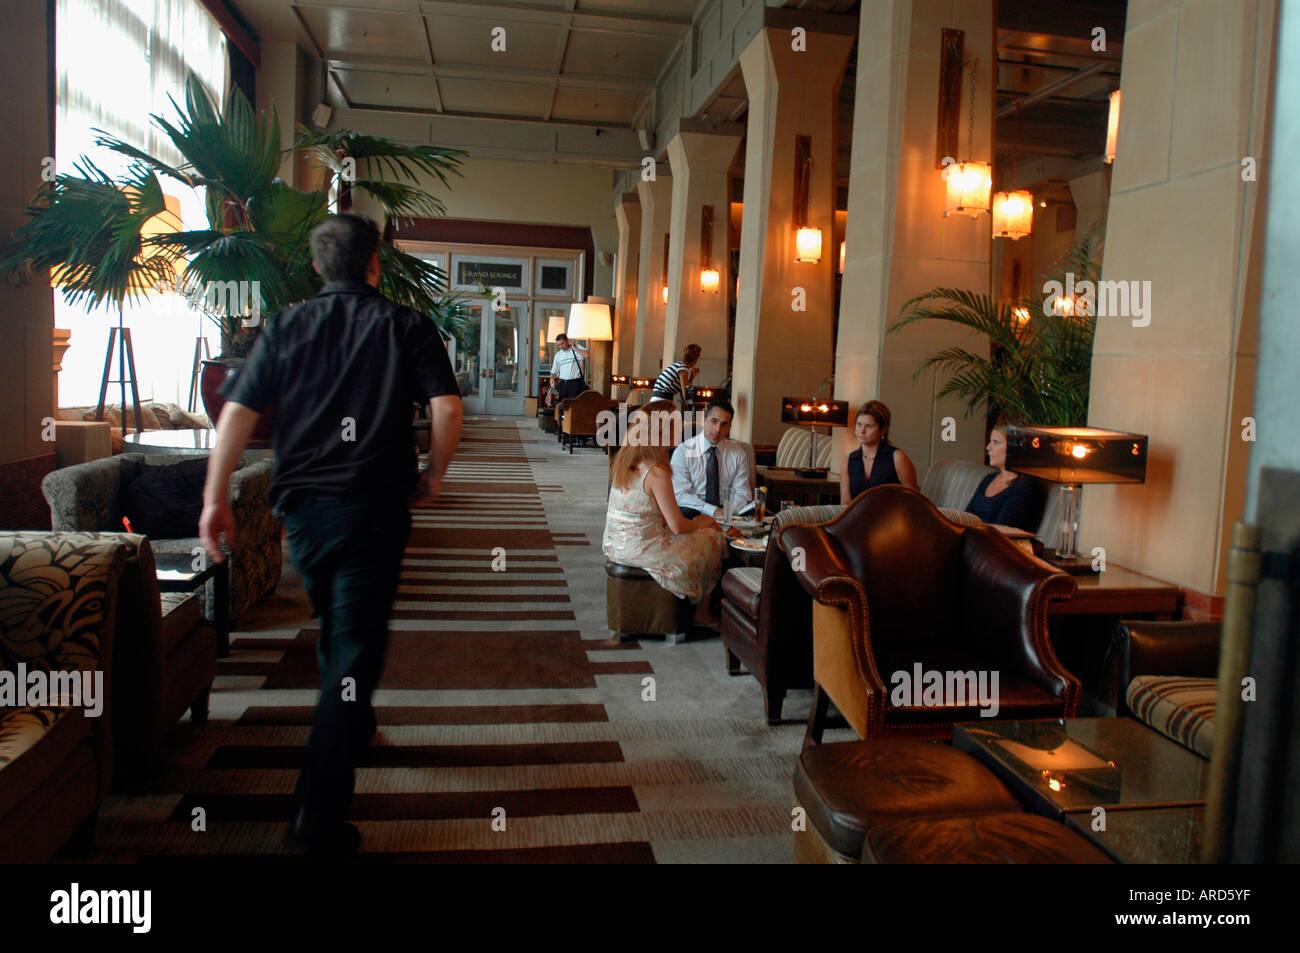 Nyc Soho Interior Stockfotos Und Bilder Kaufen Alamy